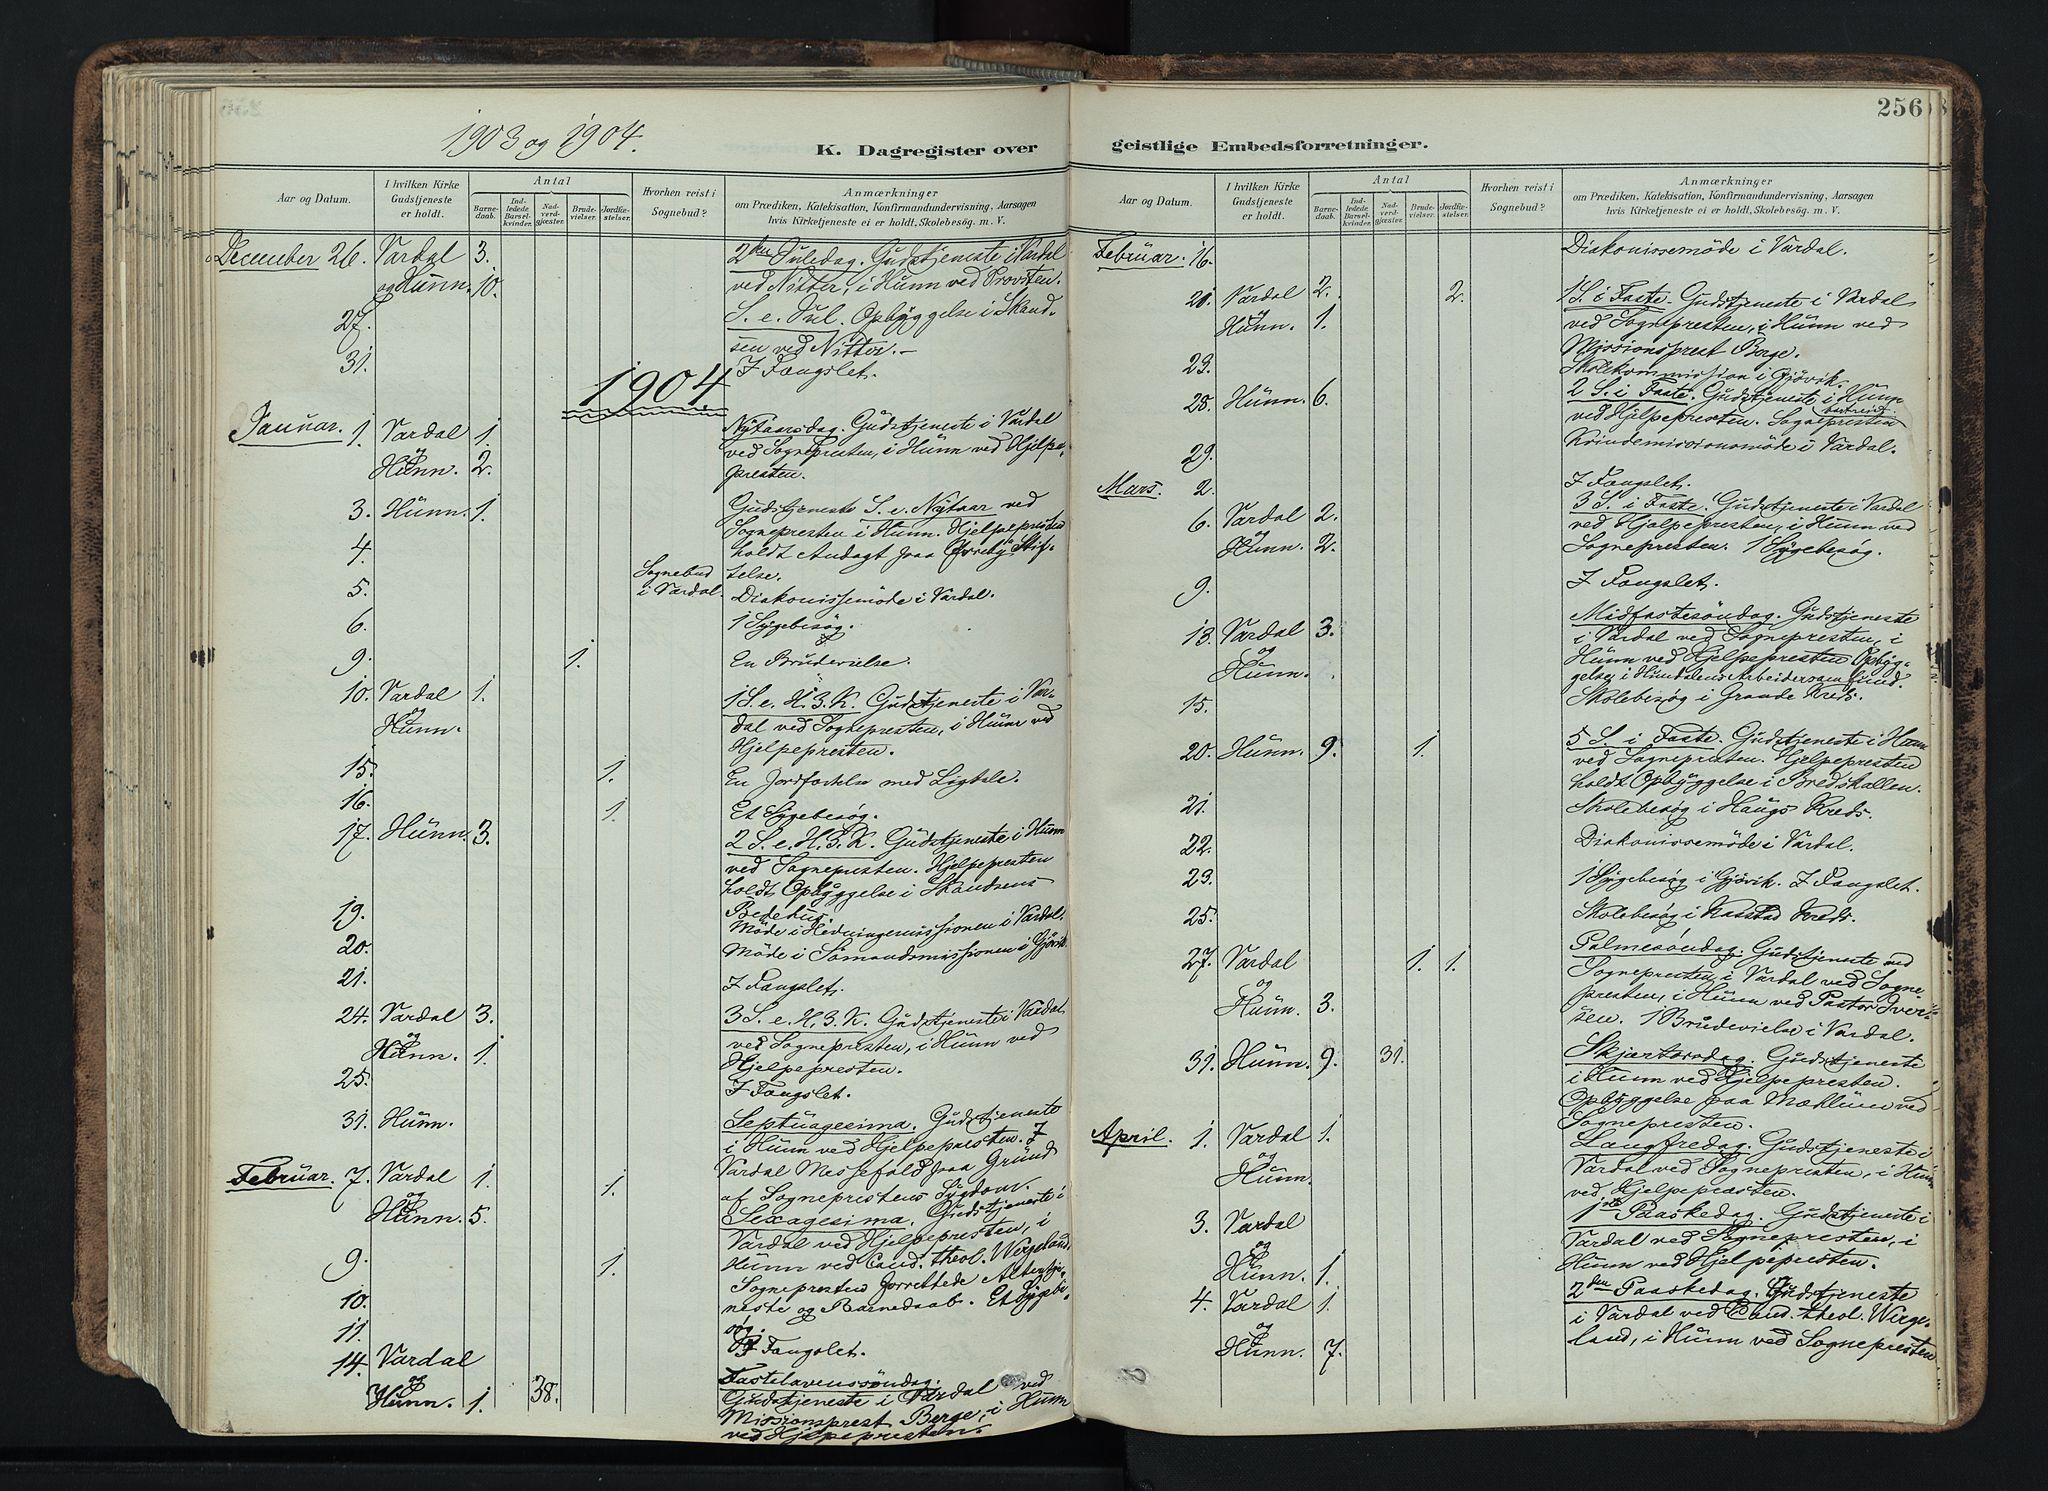 SAH, Vardal prestekontor, H/Ha/Haa/L0019: Ministerialbok nr. 19, 1893-1907, s. 256